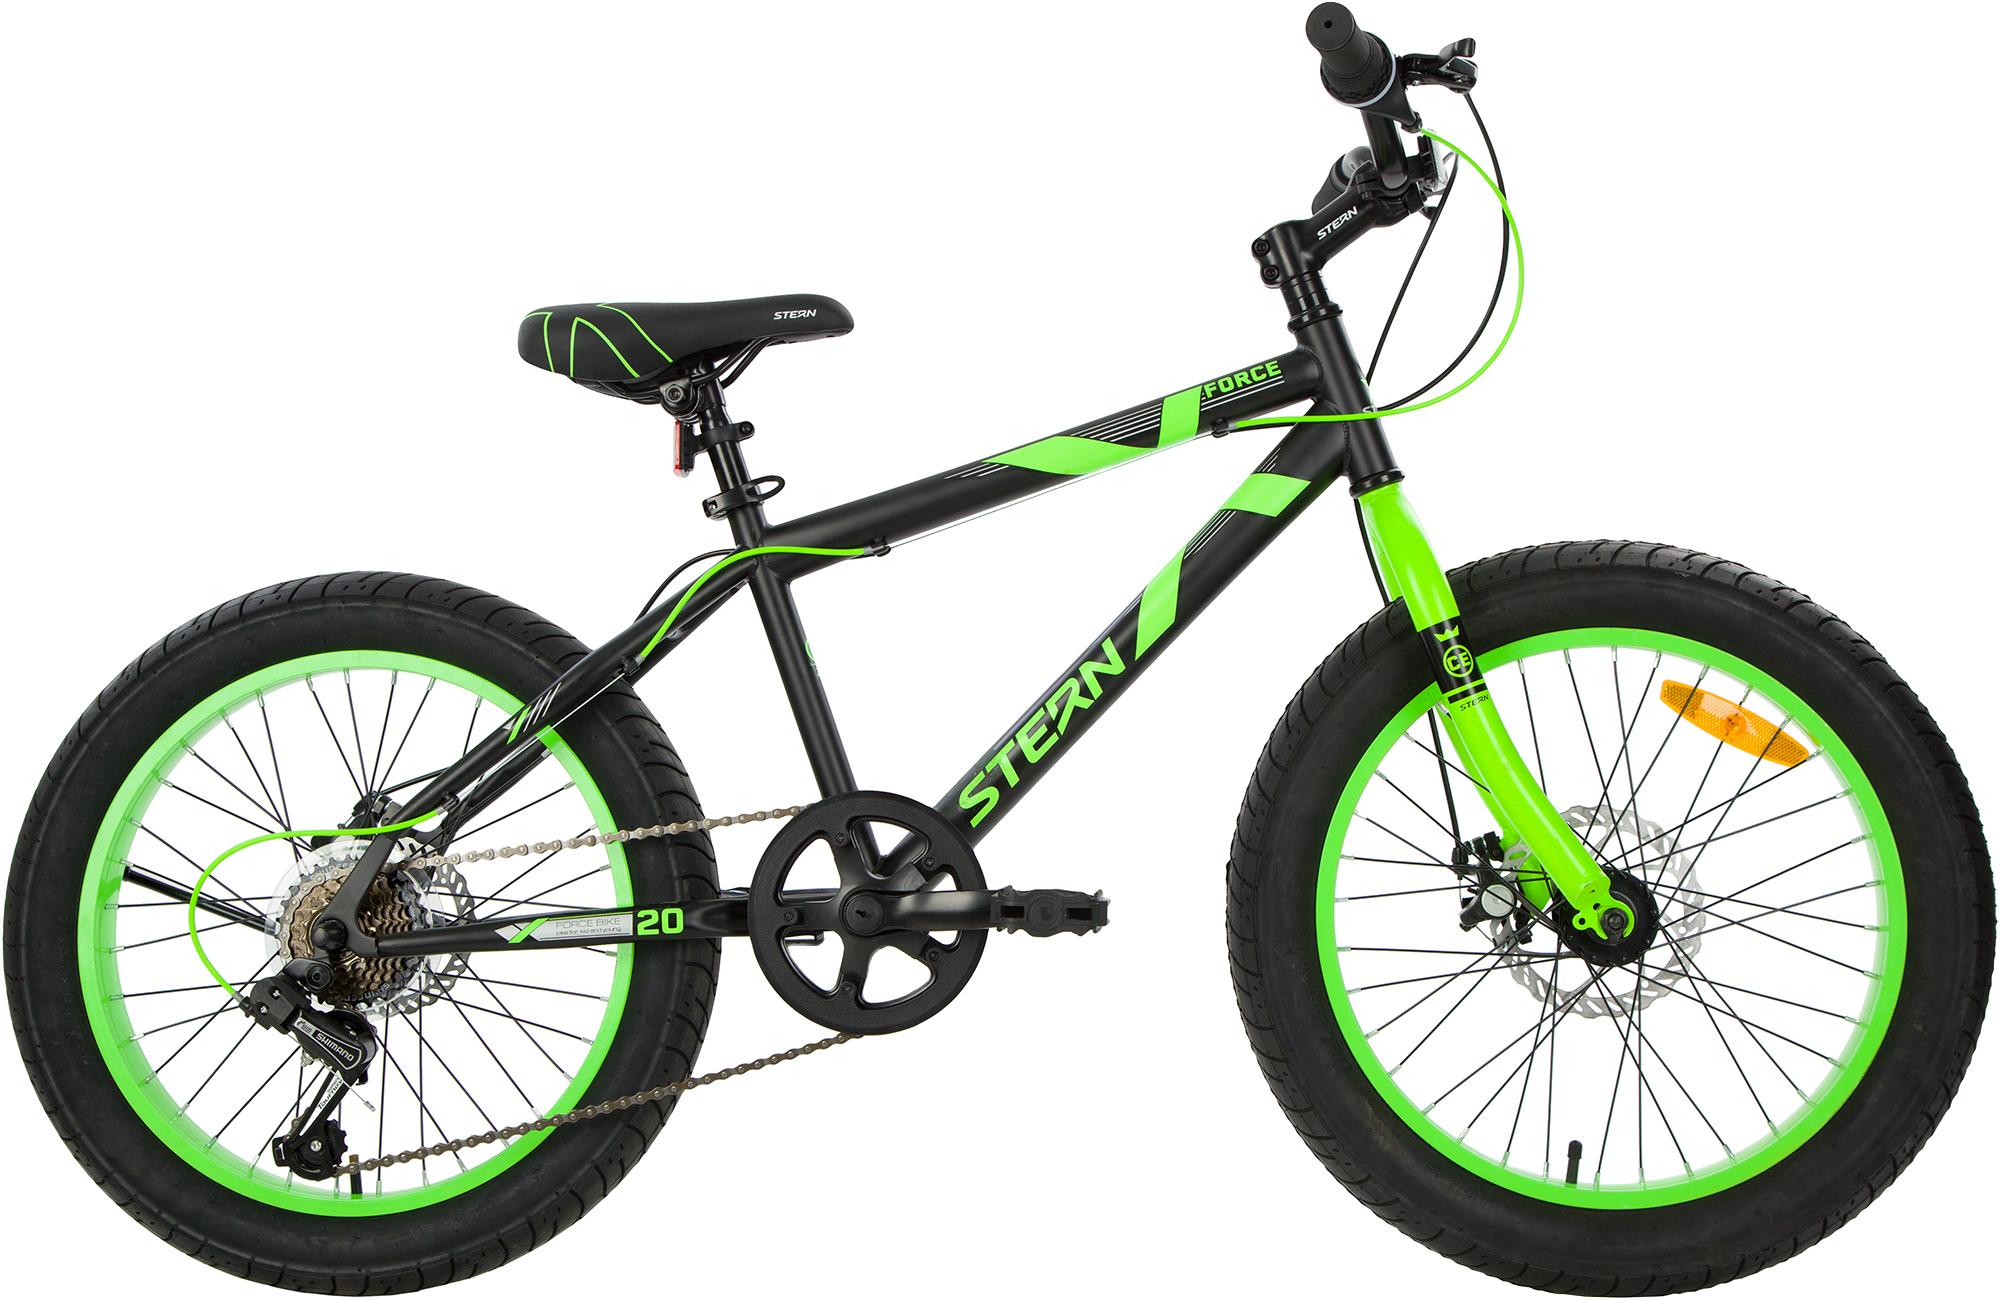 Stern Велосипед для мальчиков Stern Force 20